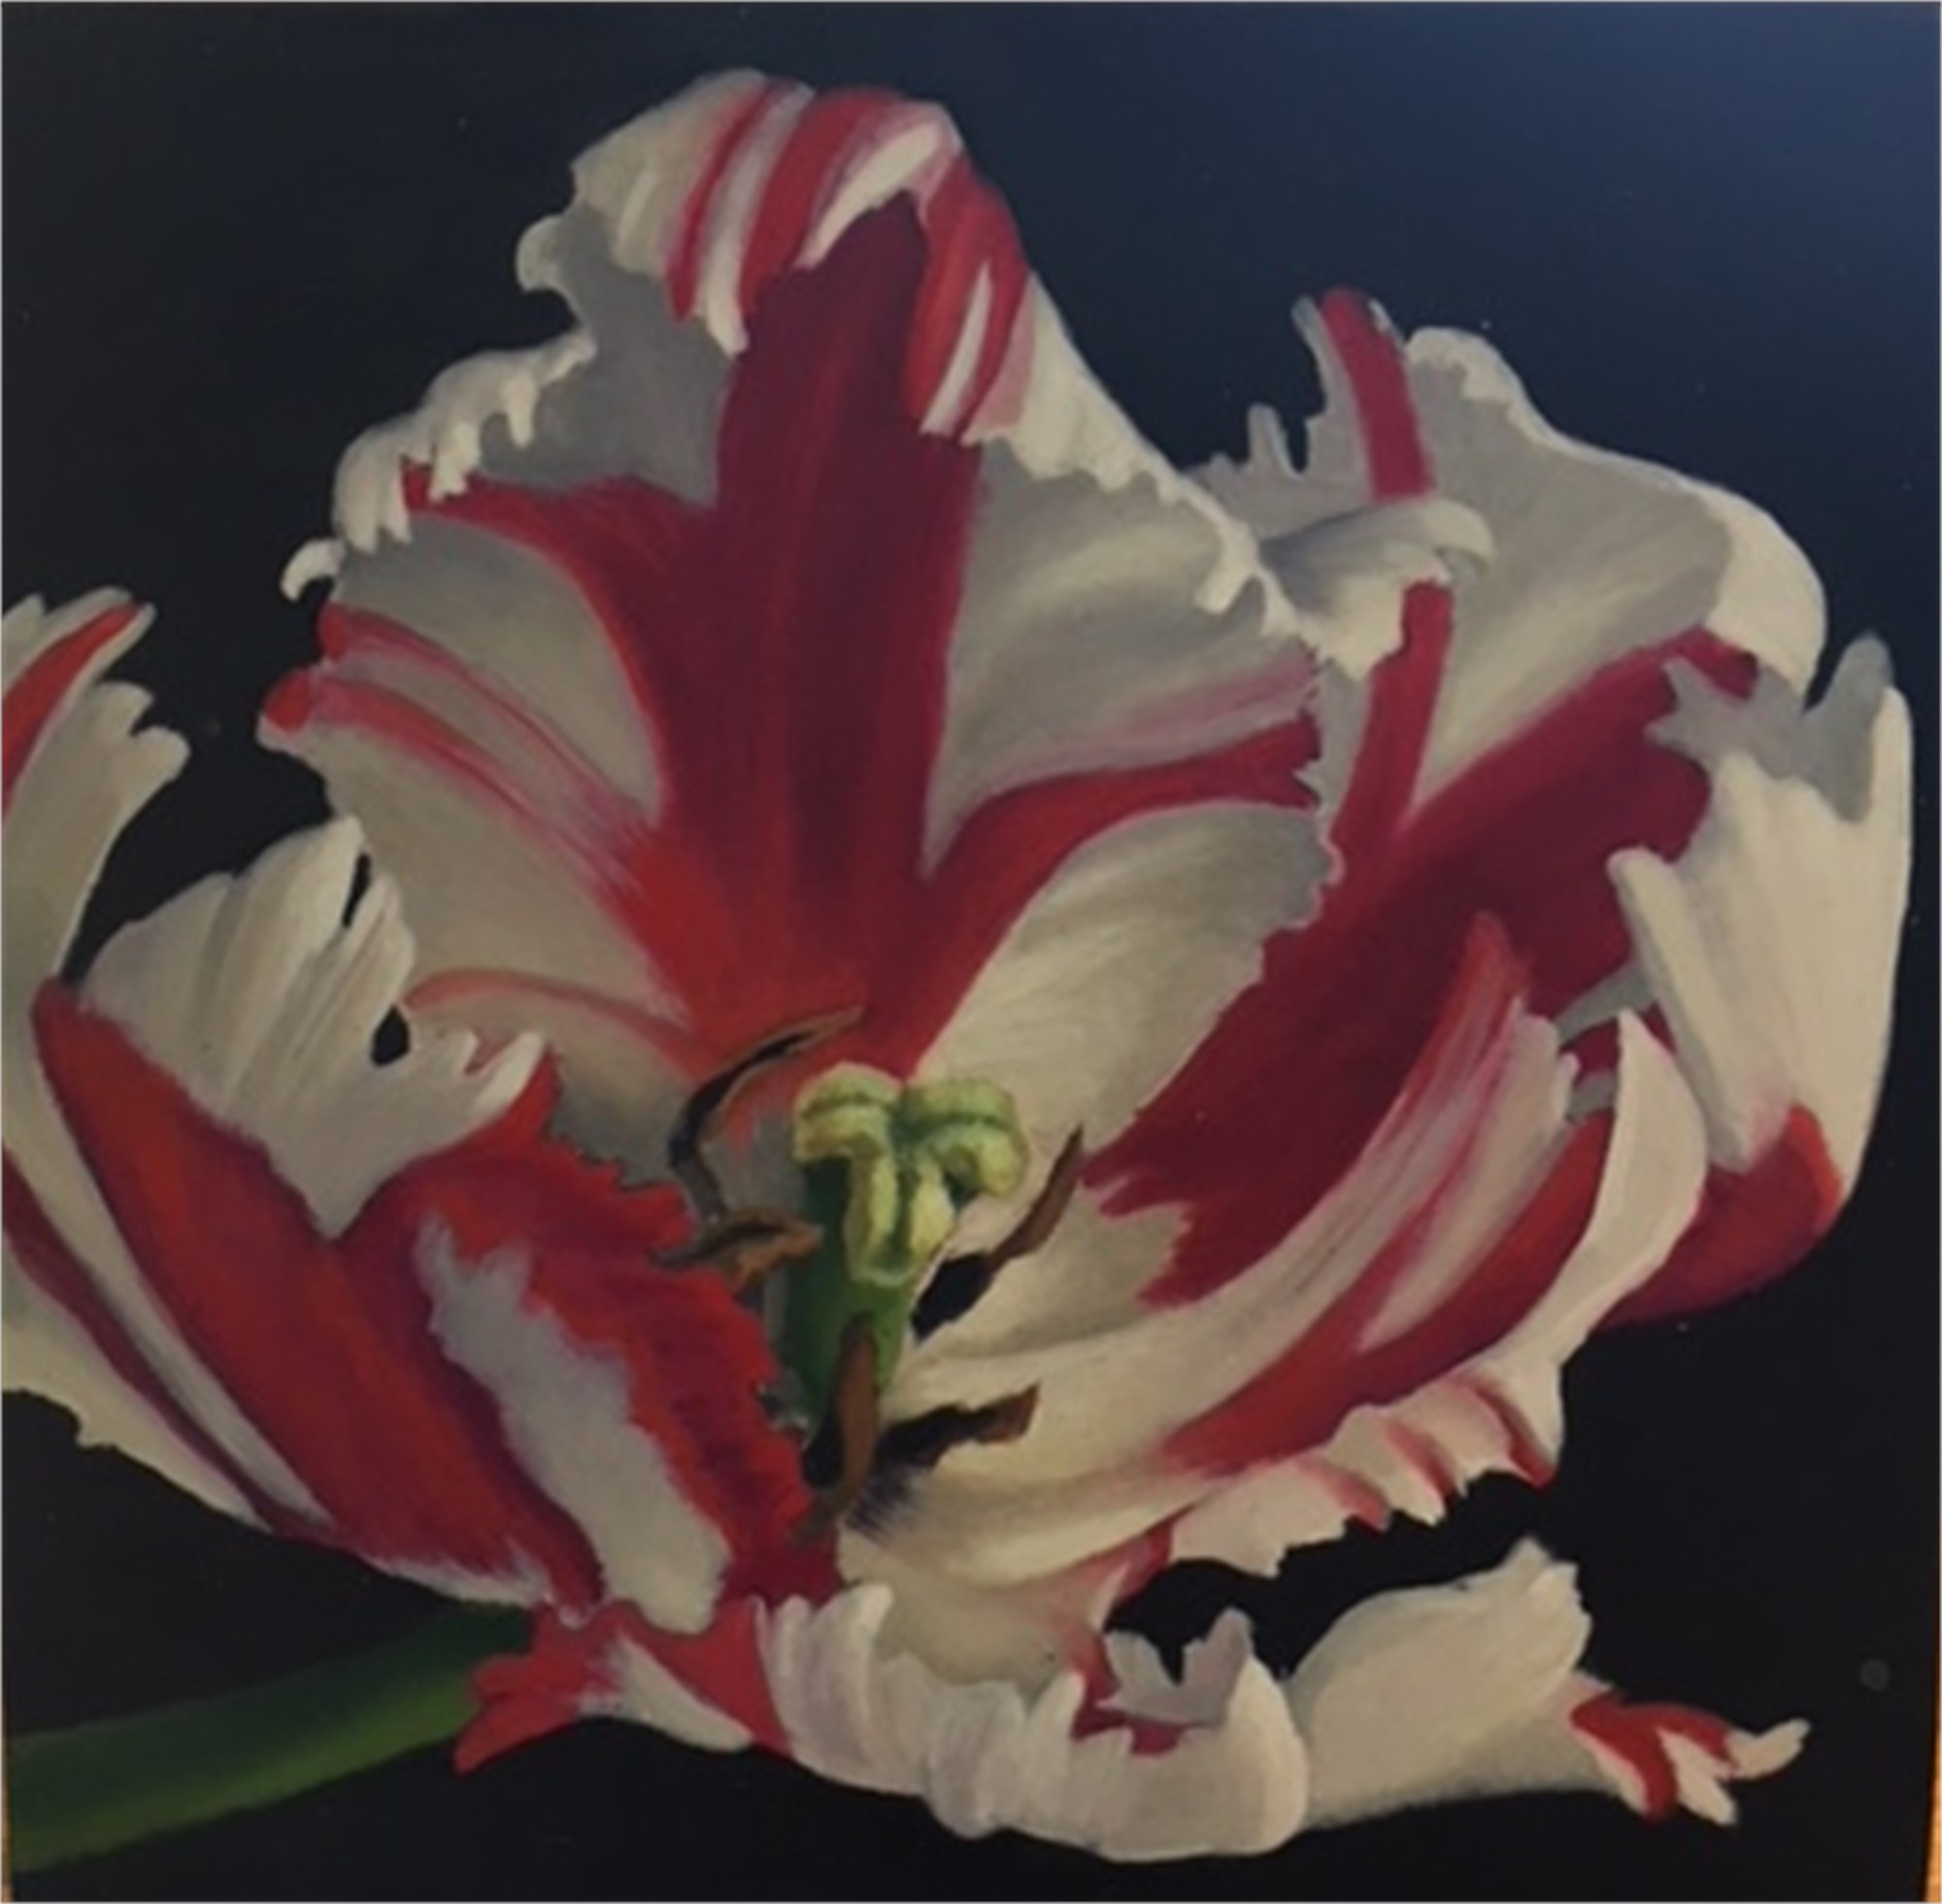 Candy Cane Tulip by Sarah van der Helm